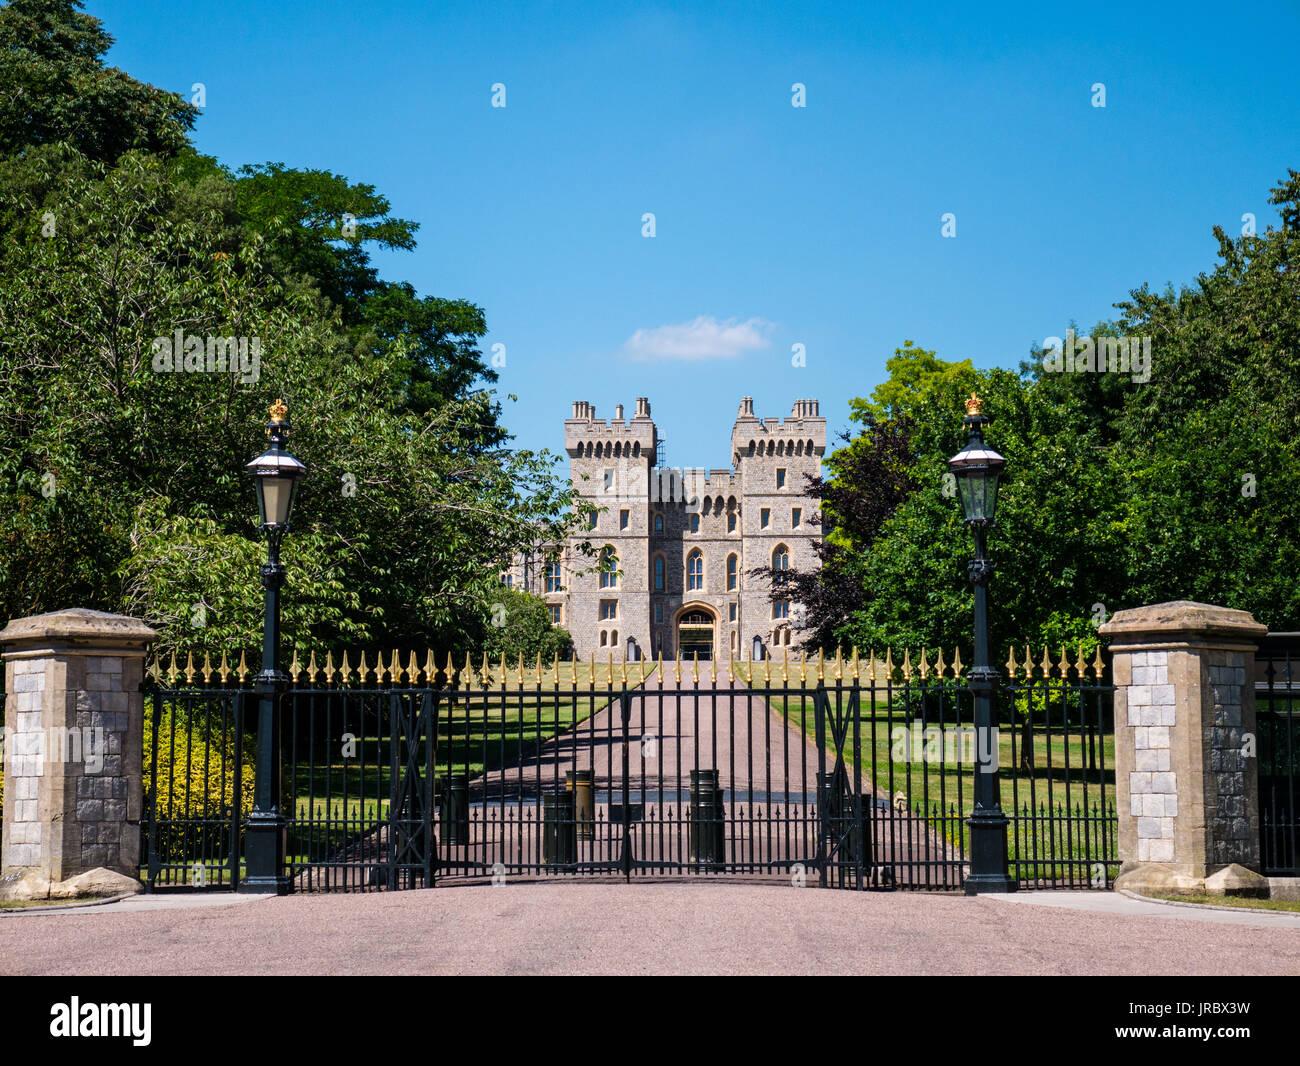 Windsor Castle Blick von dem langen Spaziergang, Windsor, Berkshire, England Stockbild